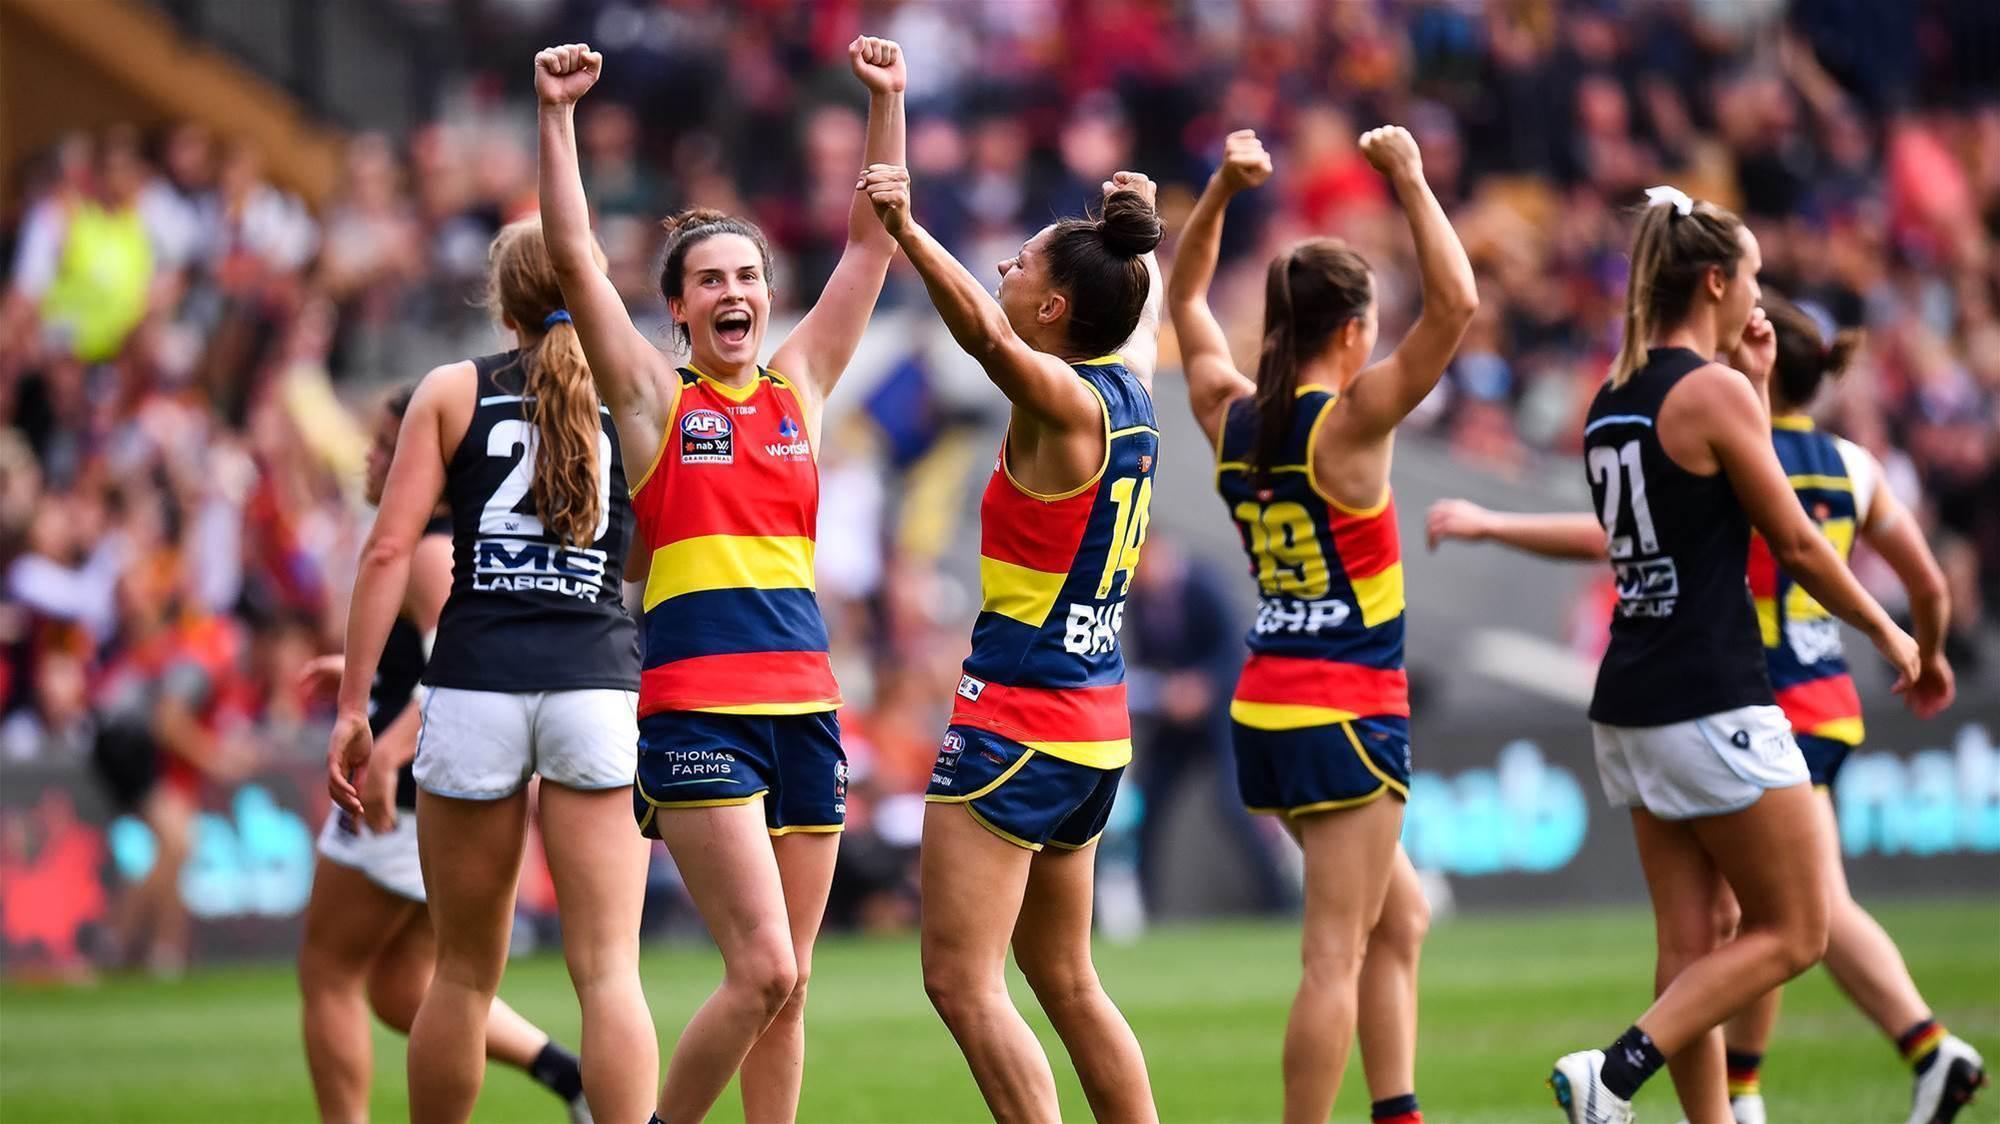 History created as Crows take Premiership